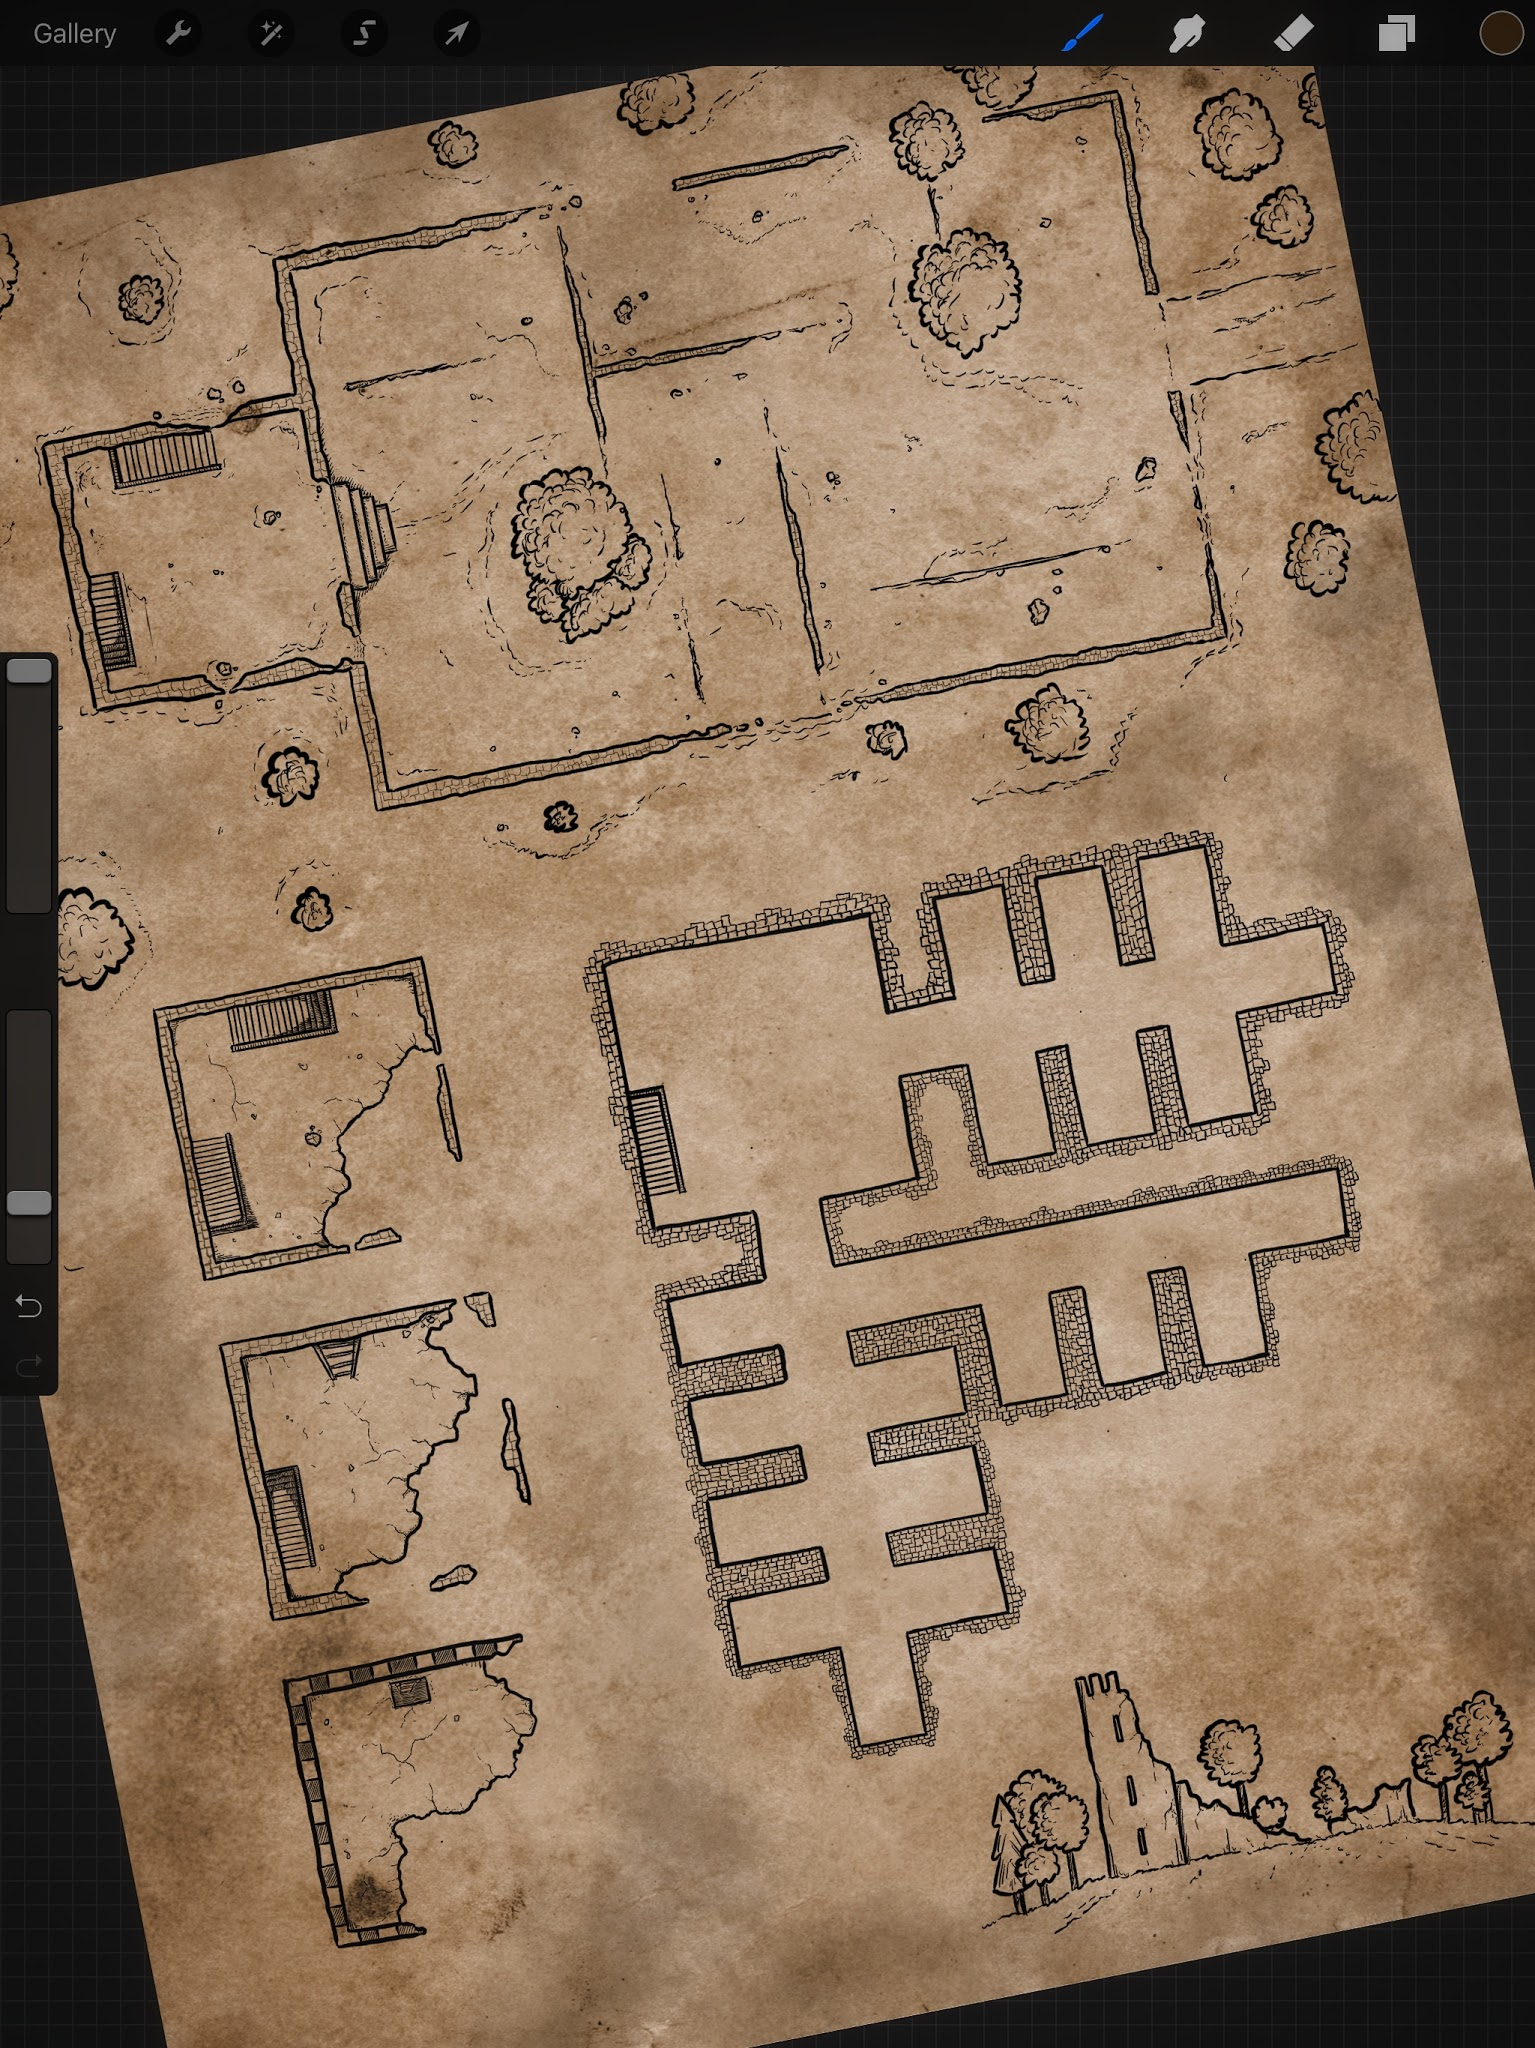 Ruin Map by Pär Lindström